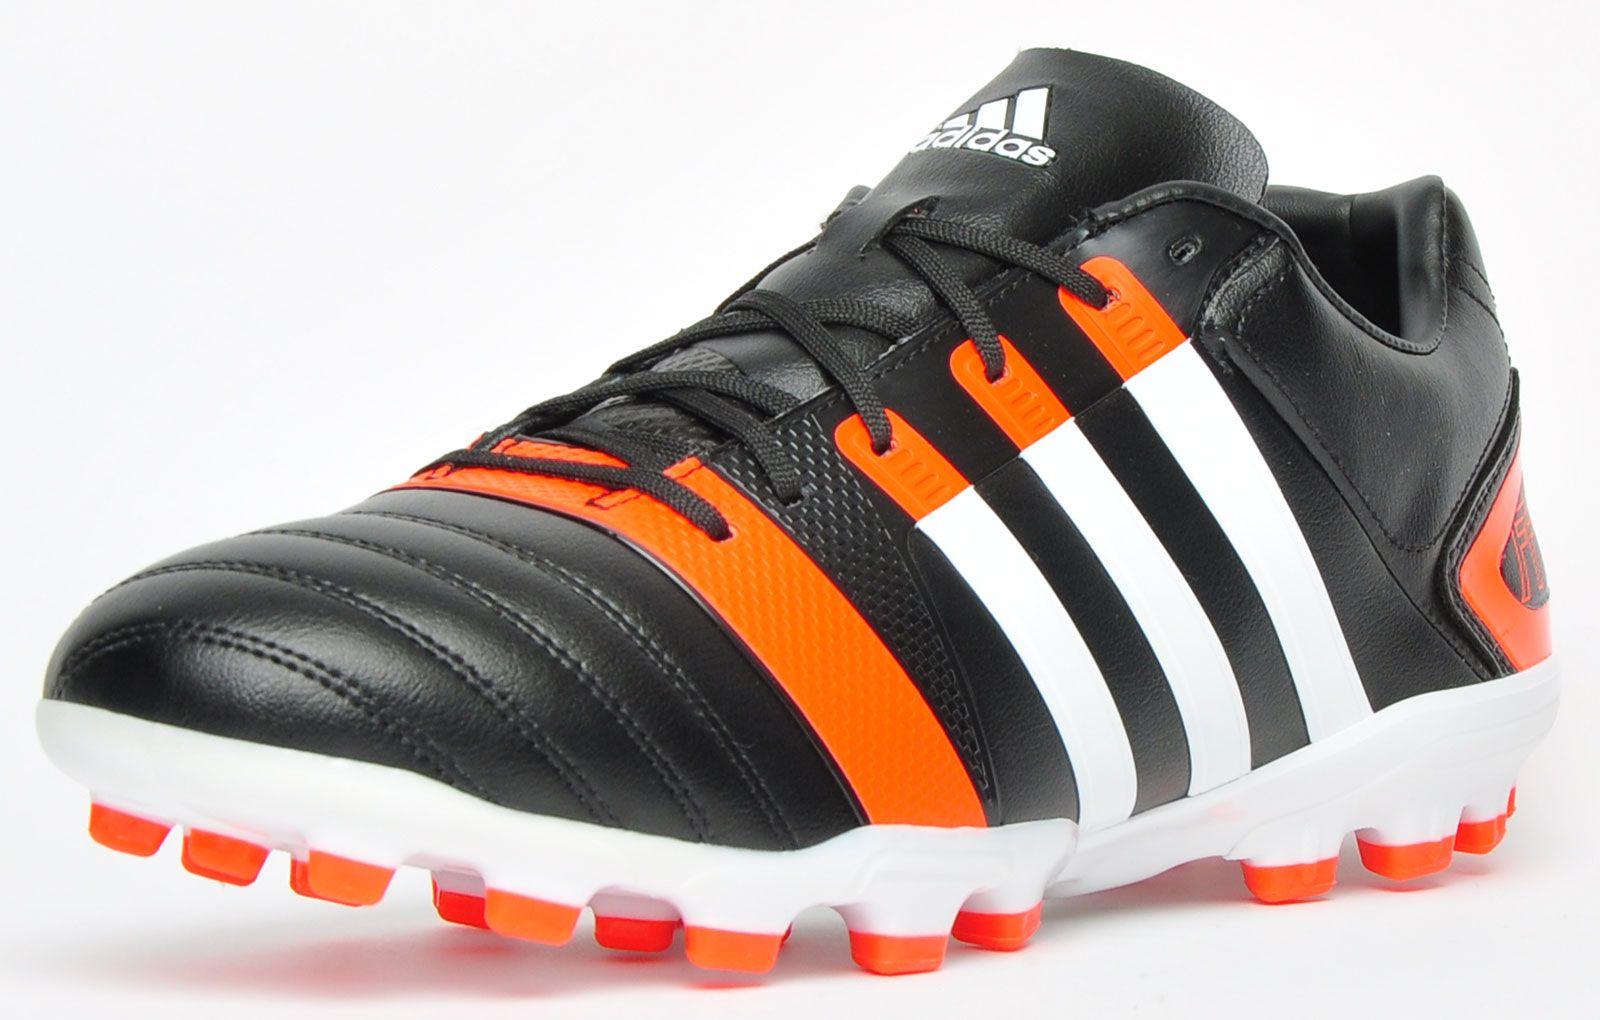 Adidas FF80 Pro TRX AG II Mens